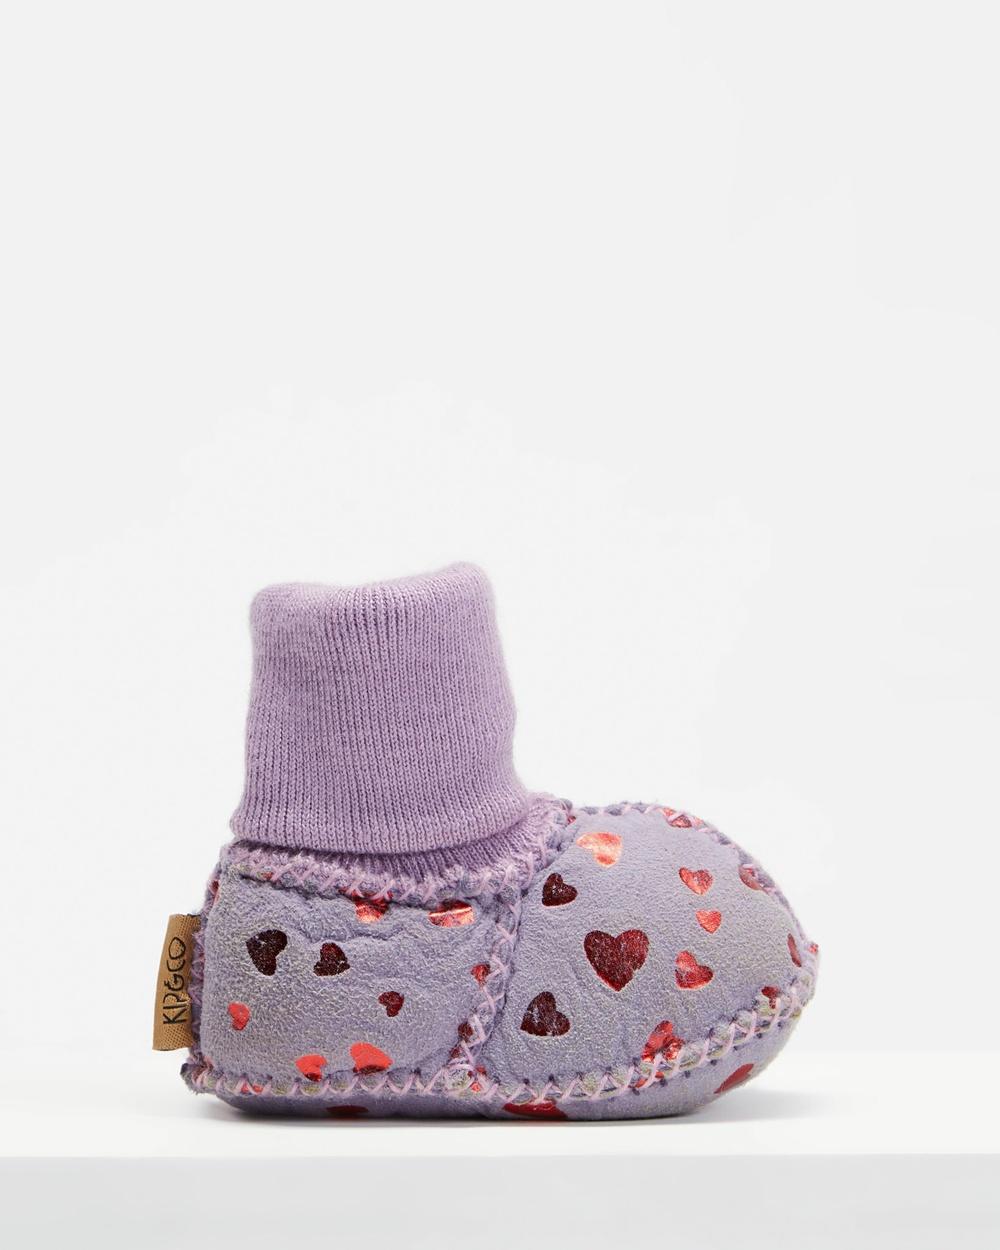 Kip&Co Sheepskin Booties Socks Lilac Printed Heart